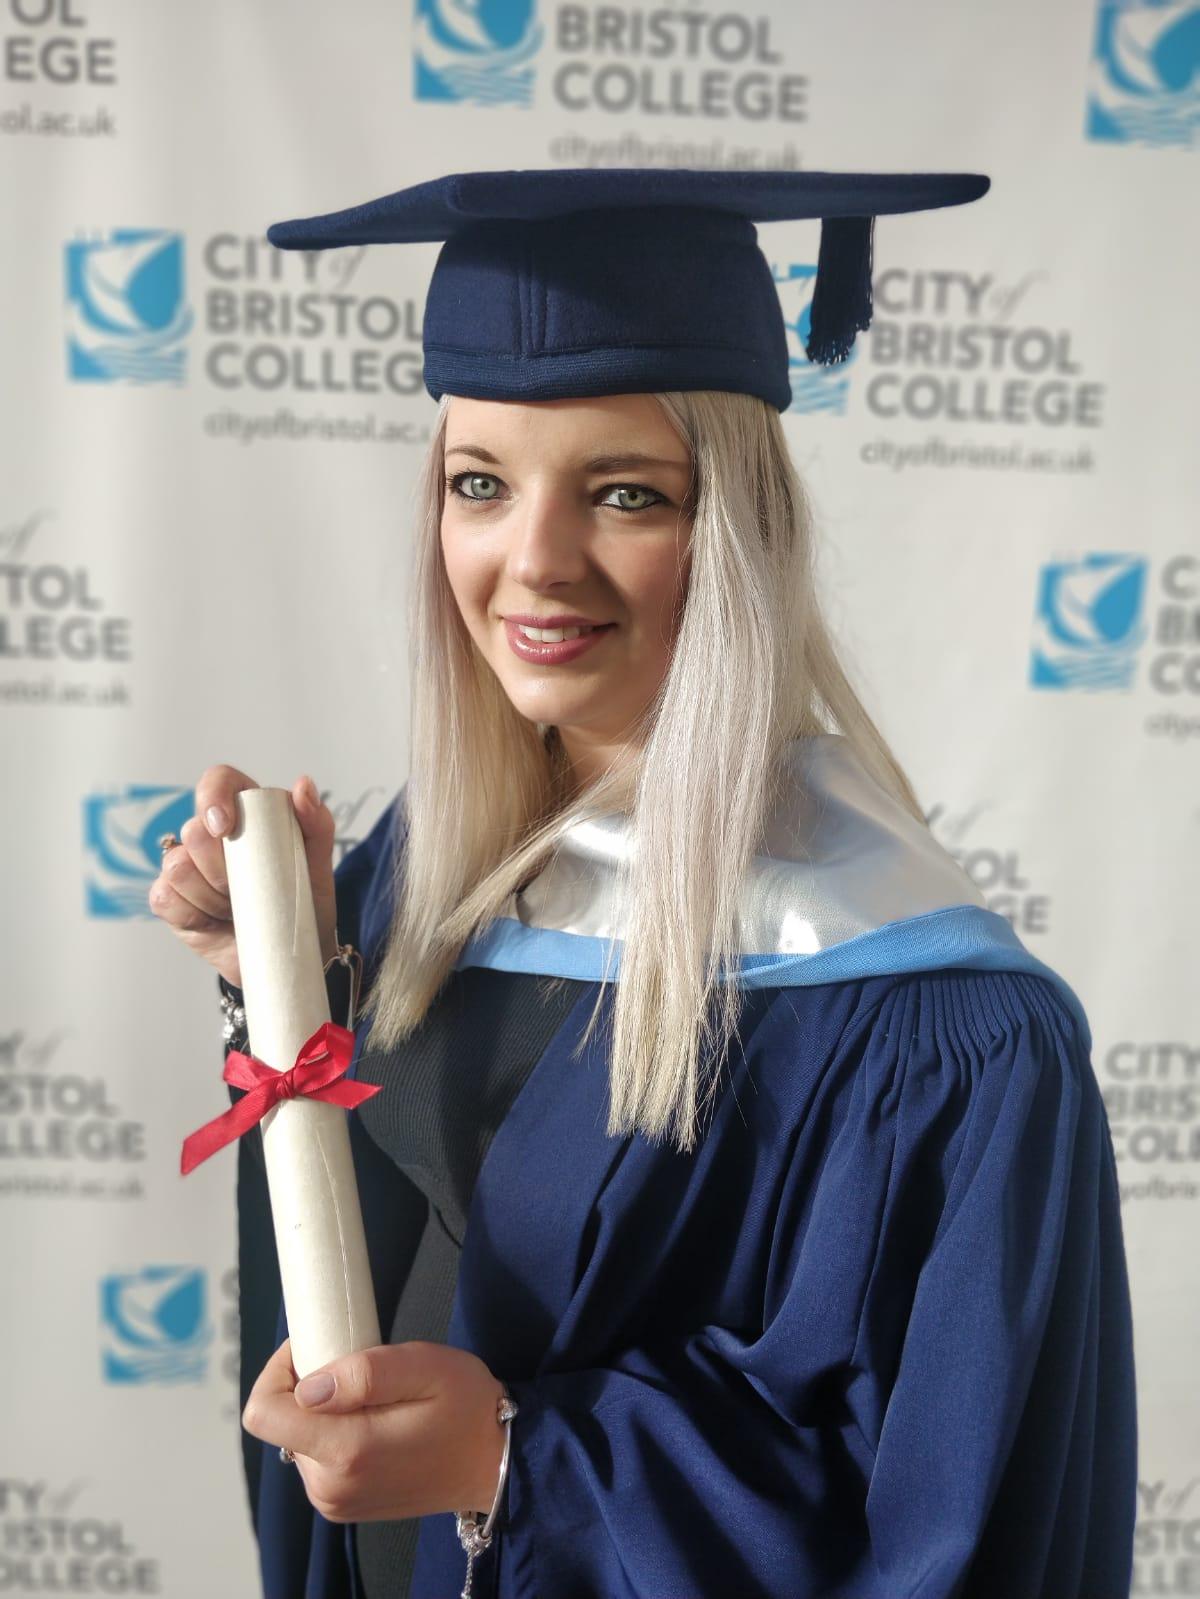 Bristol Graduates 2020